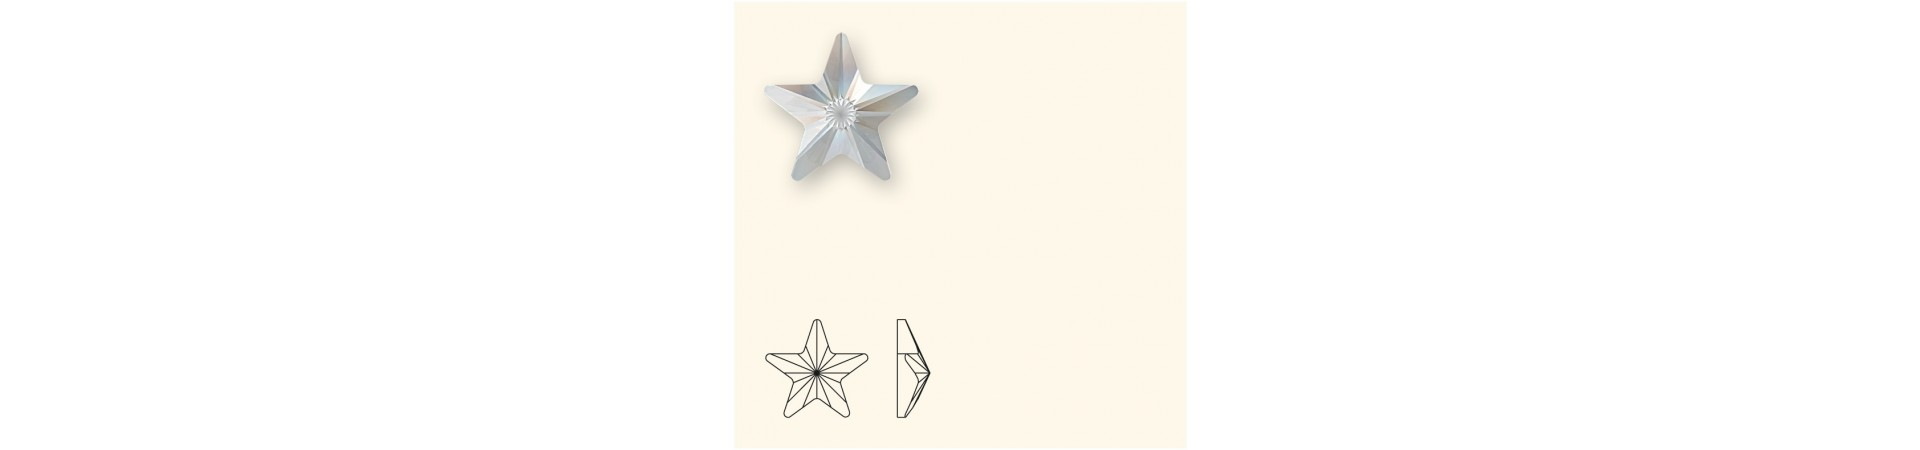 2816 Rivoli Звезда (Star) с плоским основанием